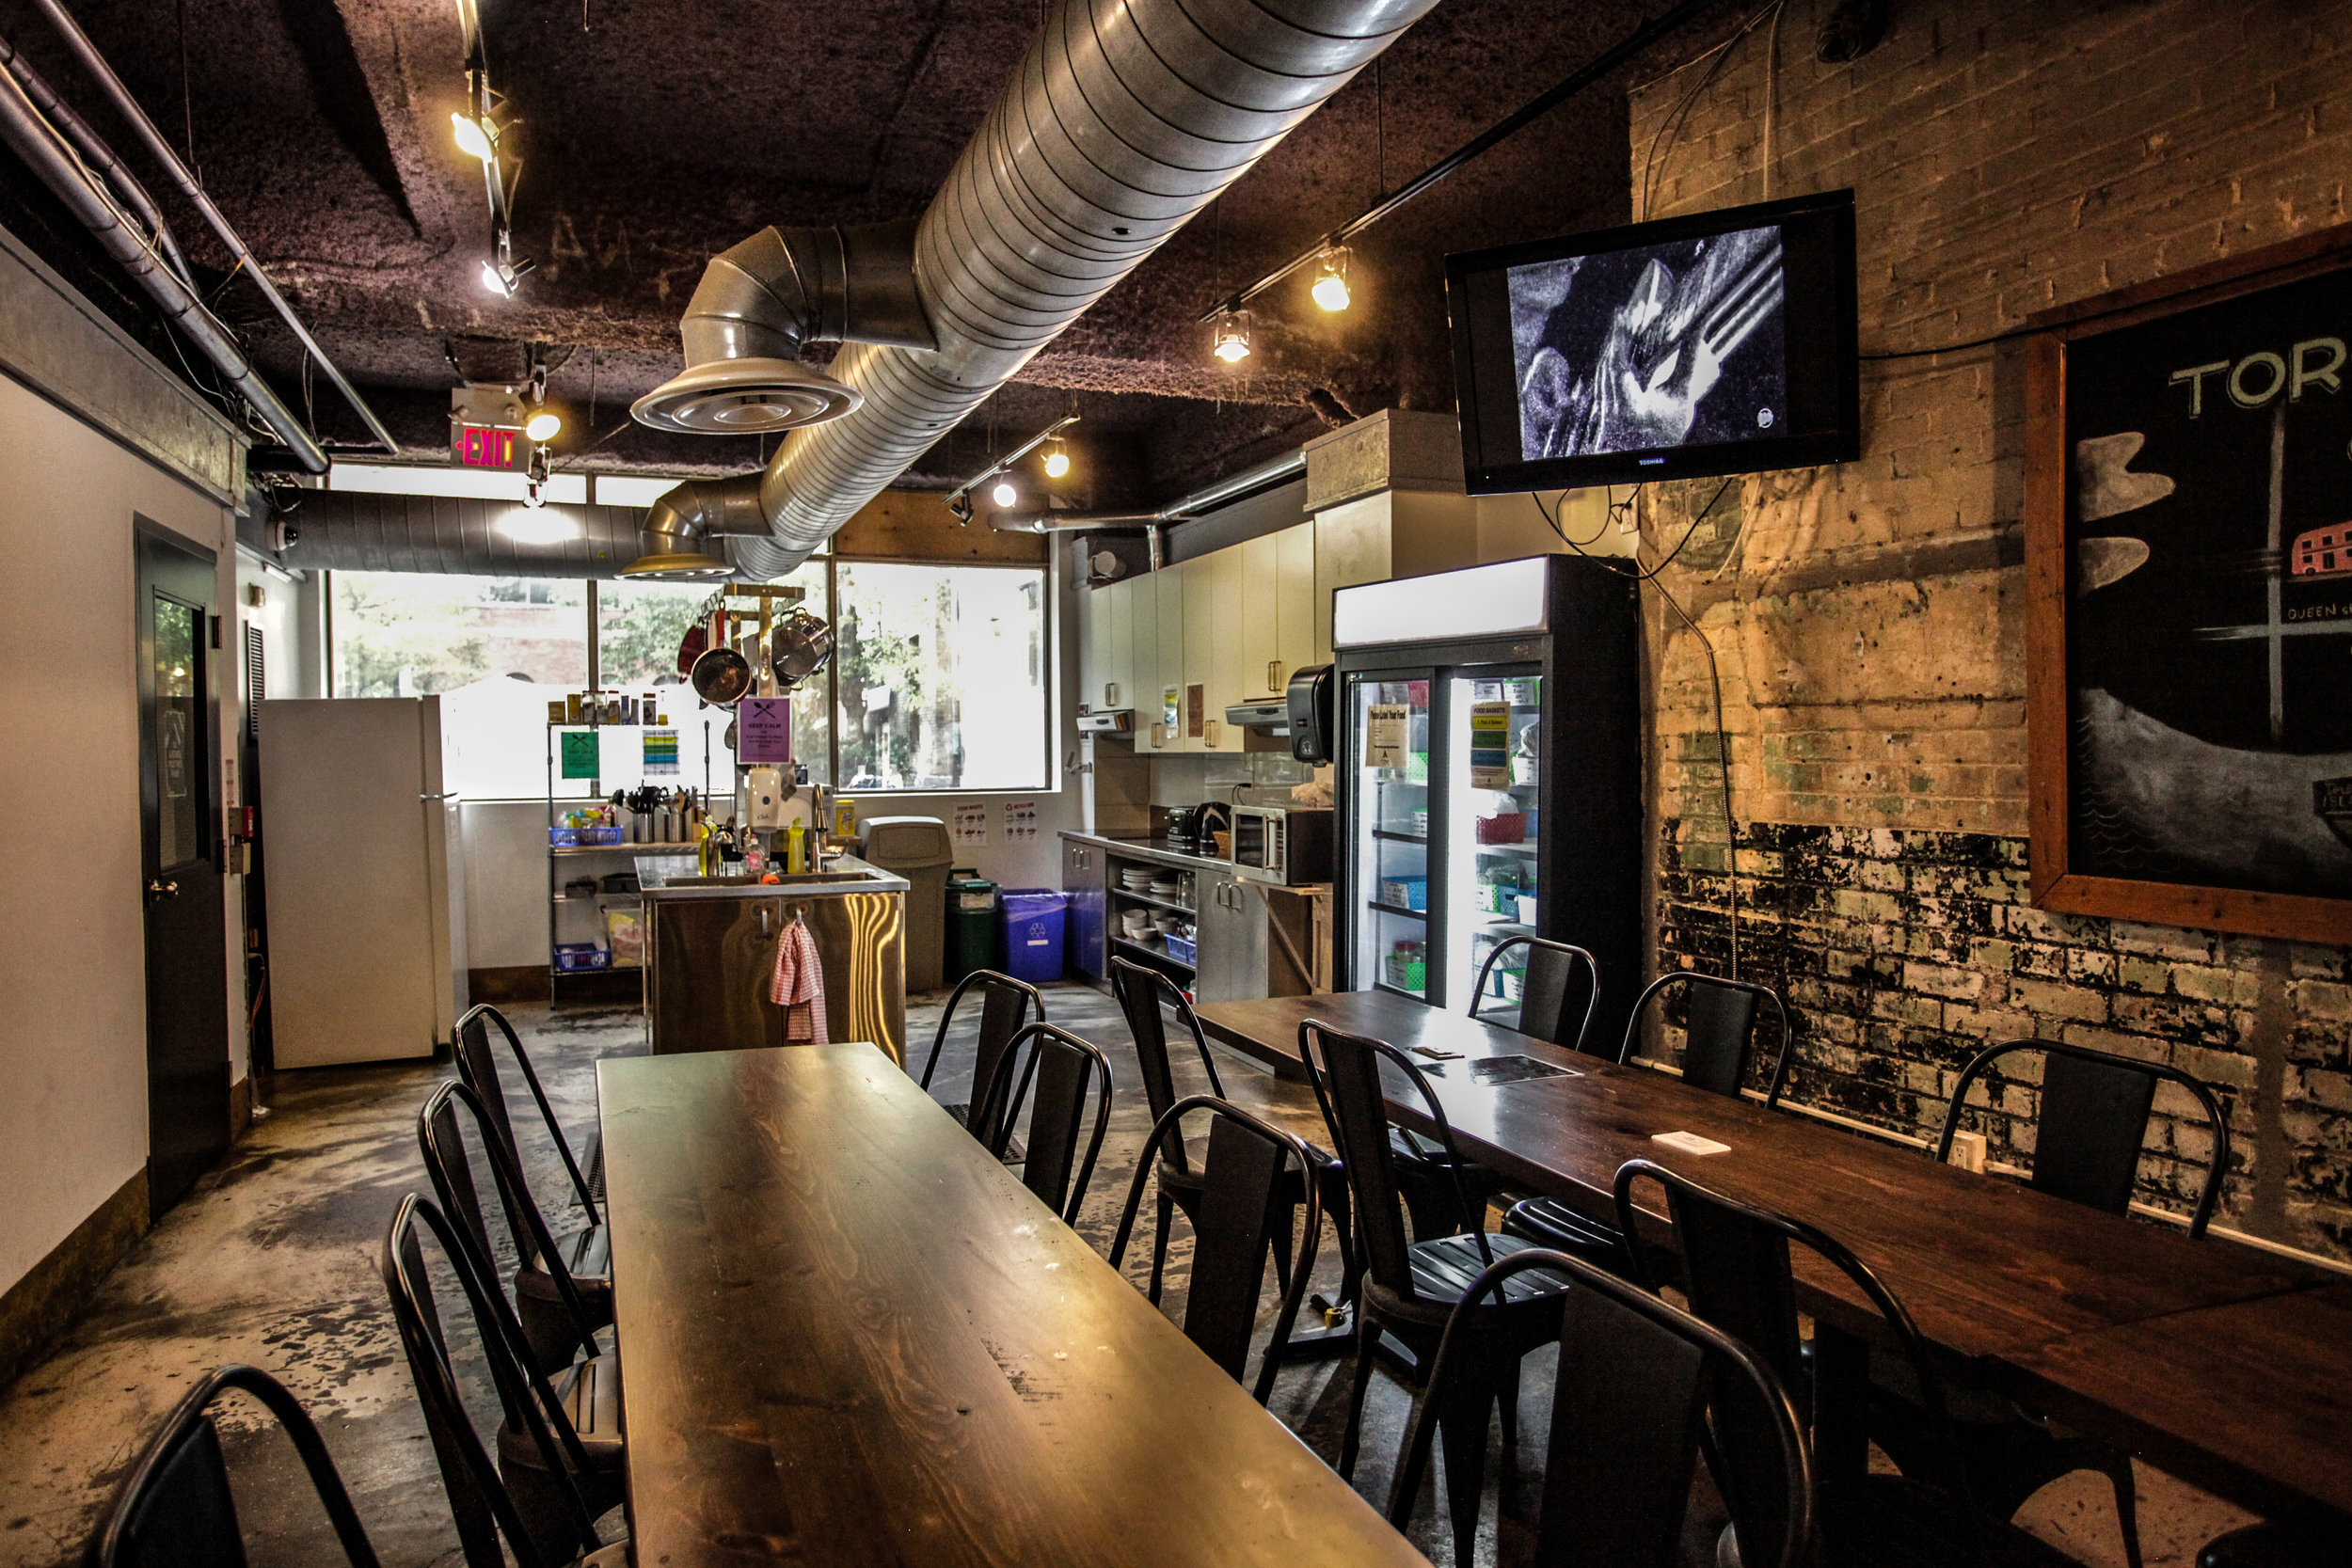 HI-Toronto-Cuisine-2-high res.jpg